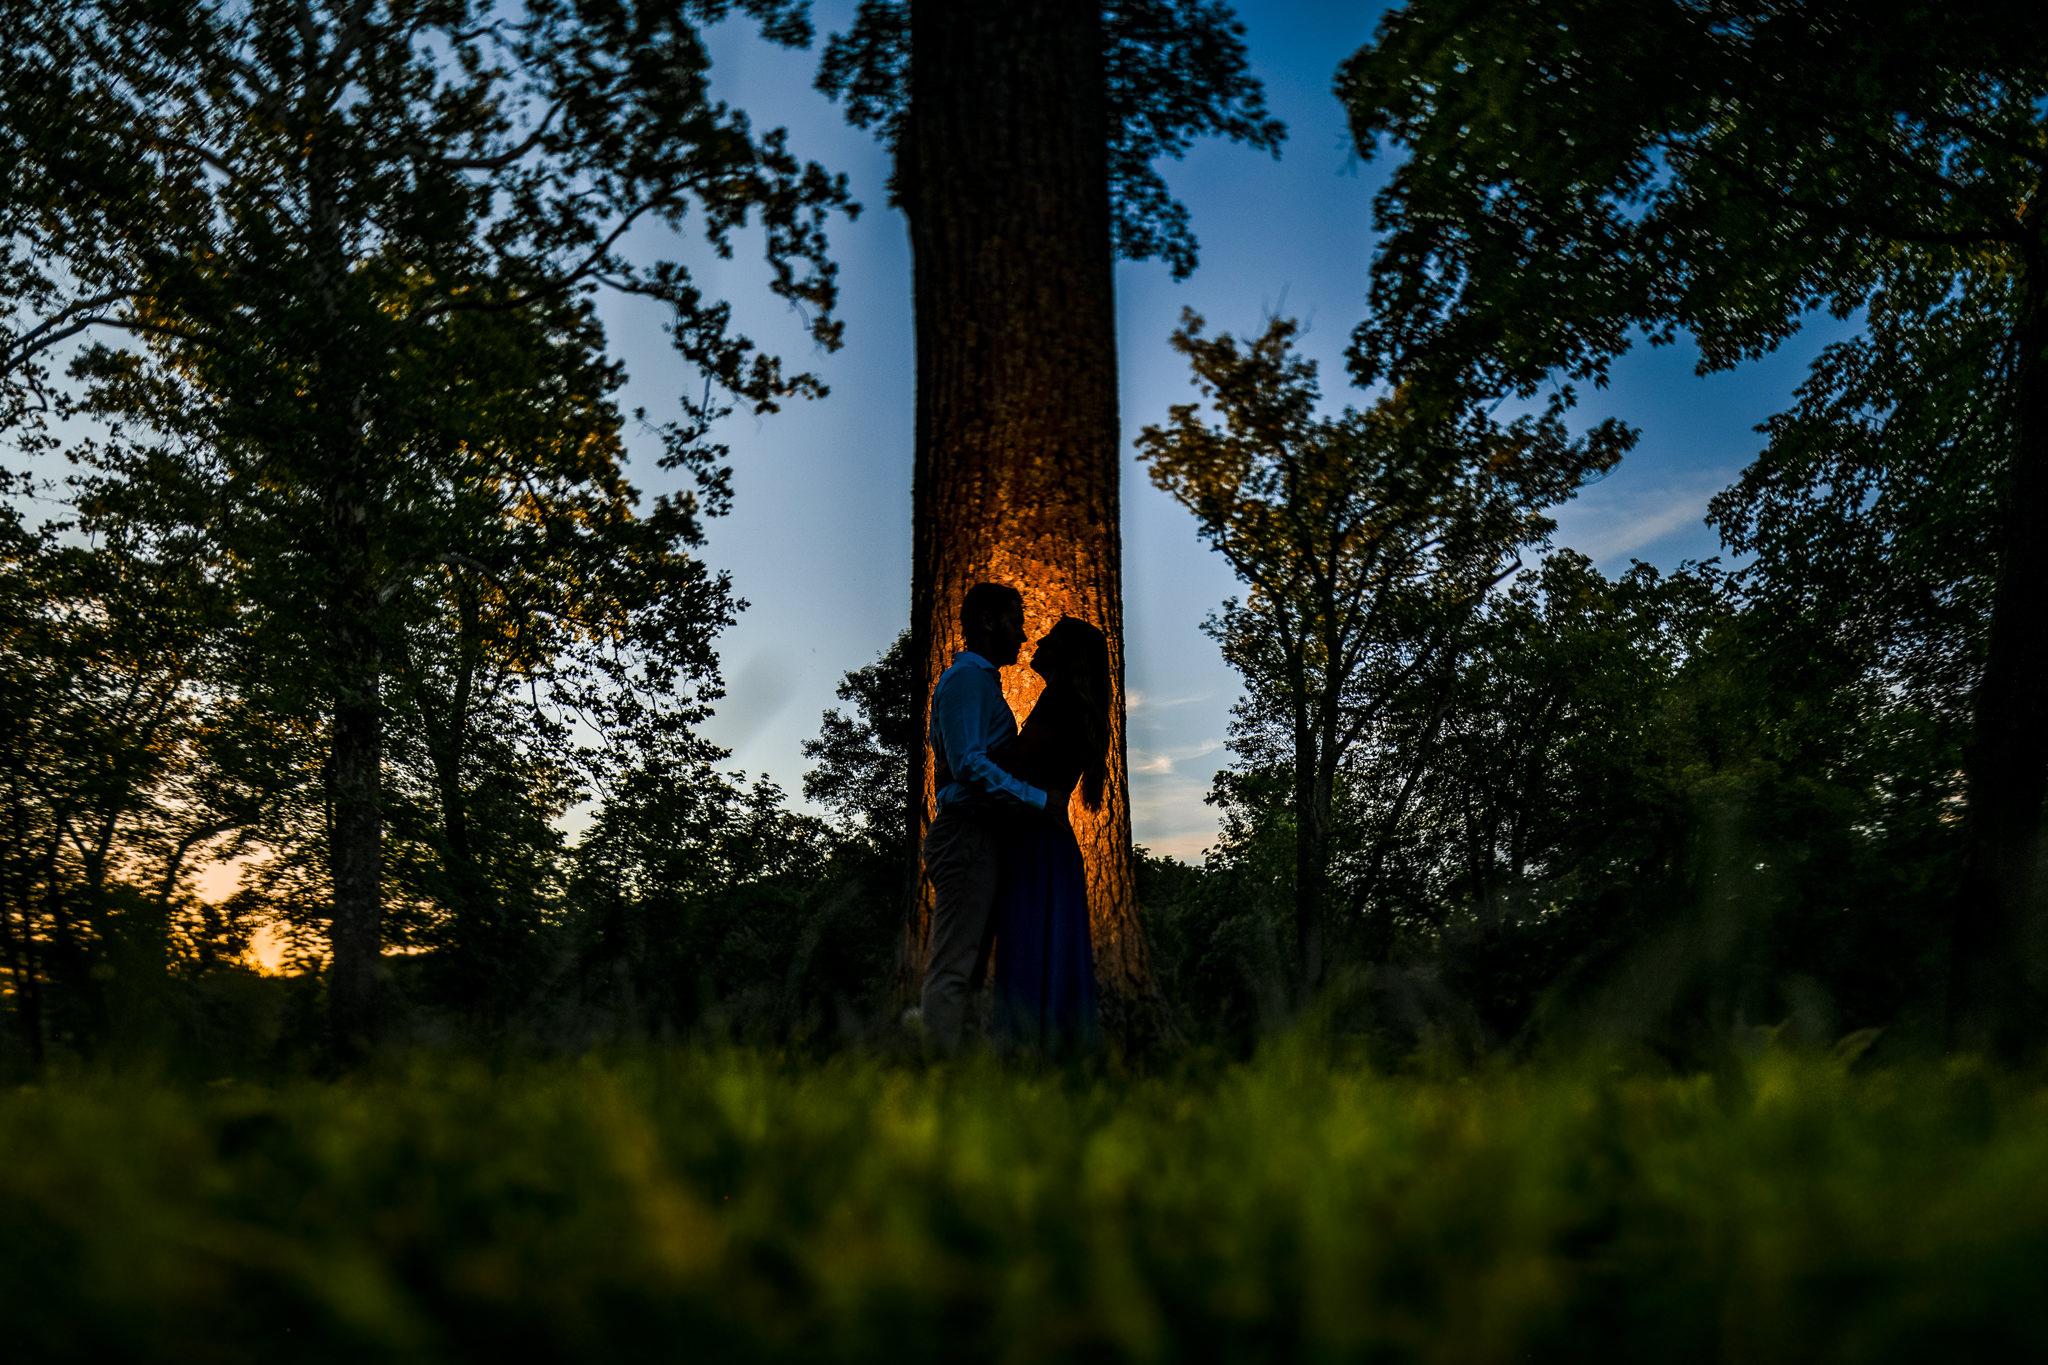 McKowen-Natirar-Park-Engagement-Photos-13.JPG